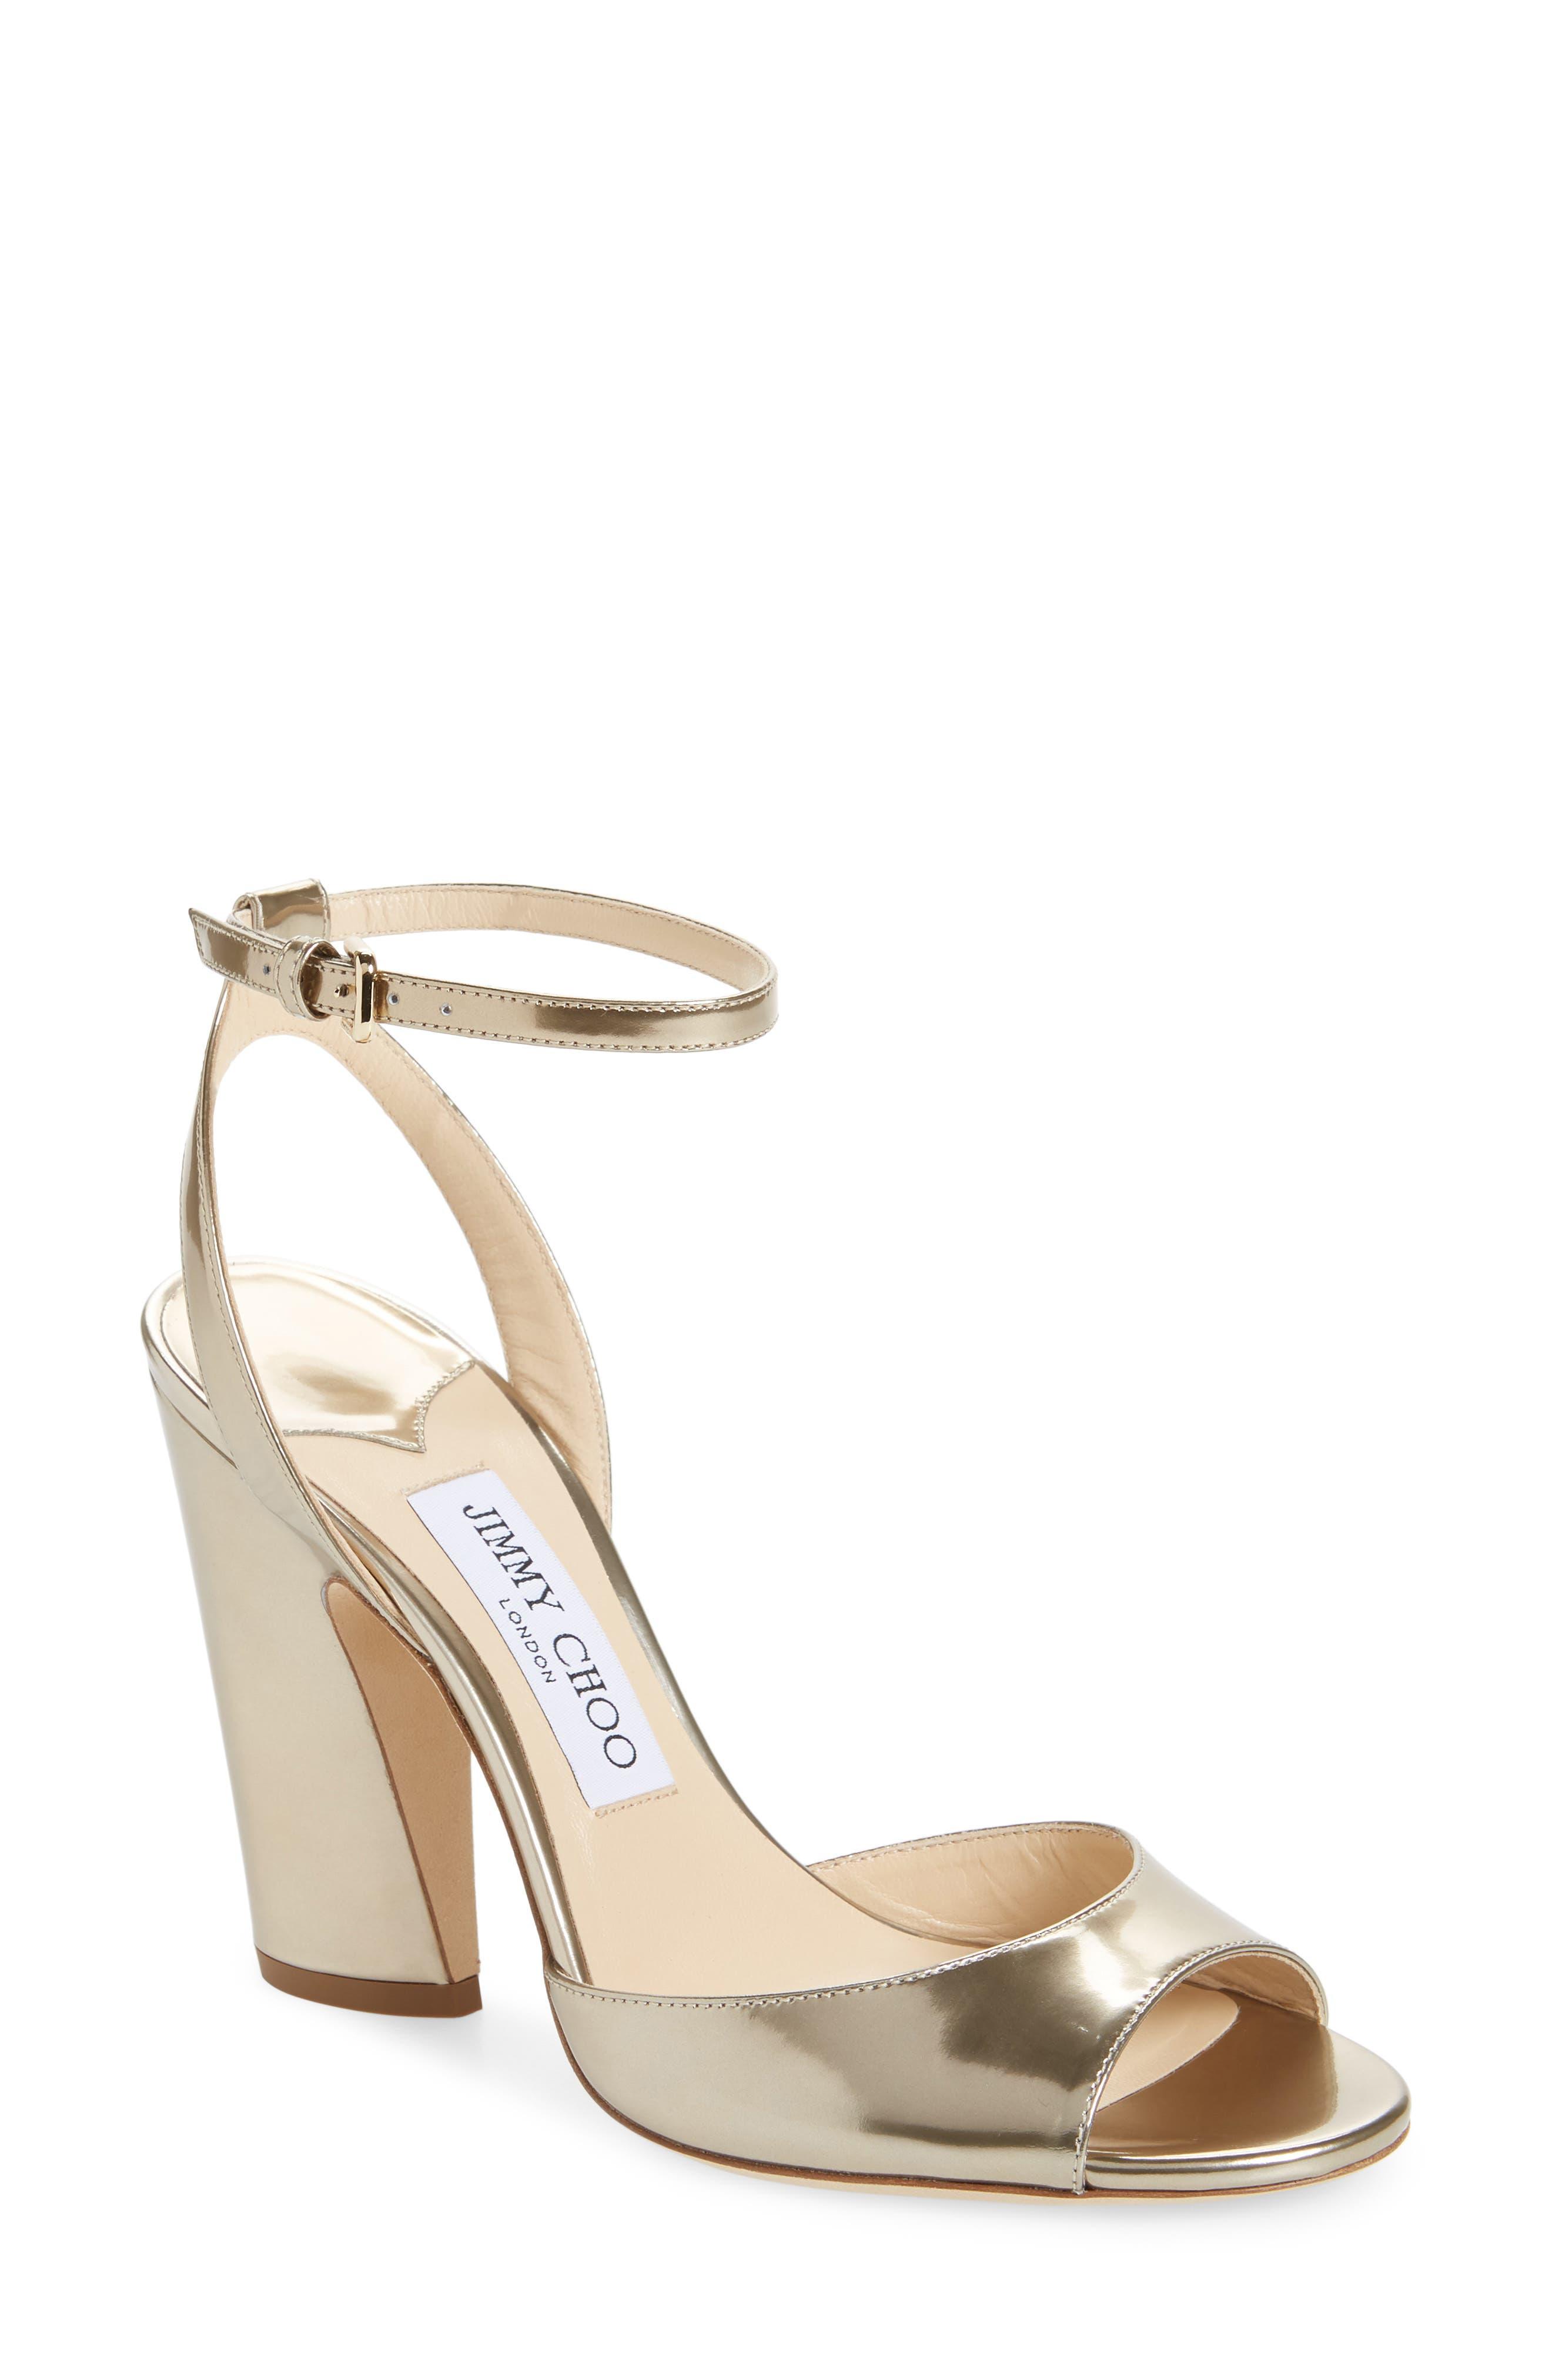 jimmy choo women s shoes nordstrom rh shop nordstrom com  jimmy choo gold abel pumps